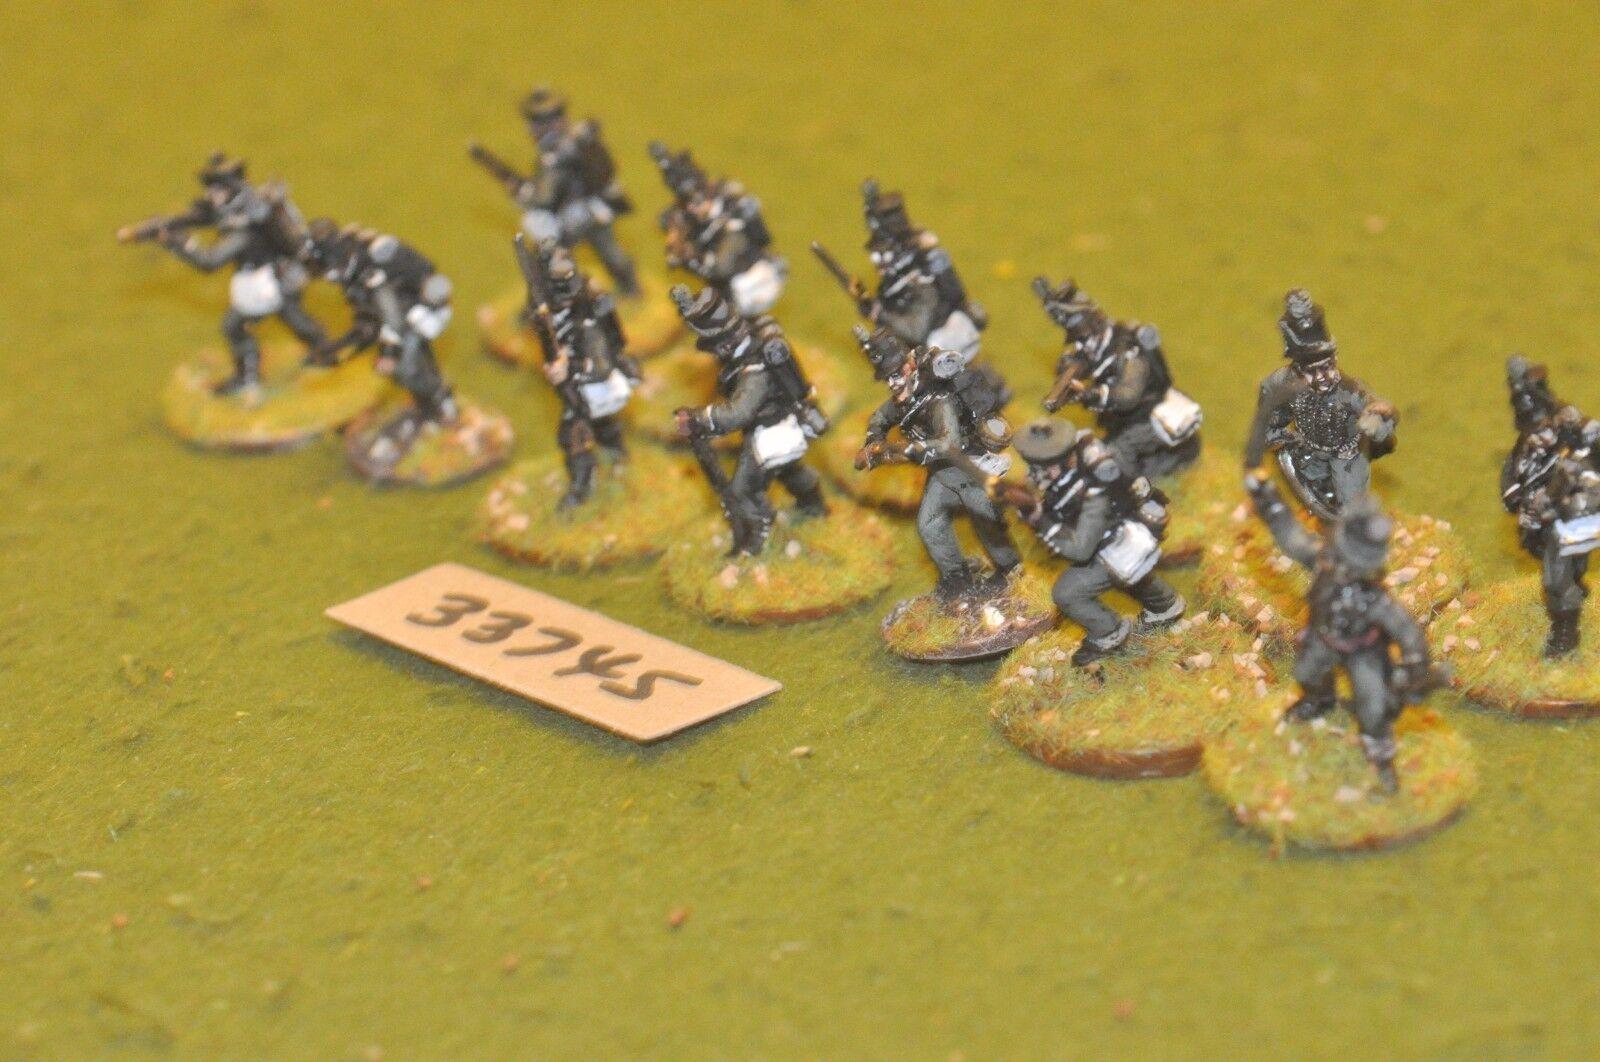 25mm napoleonic   british - rifles (part plastic) 13 figures - inf (33745)